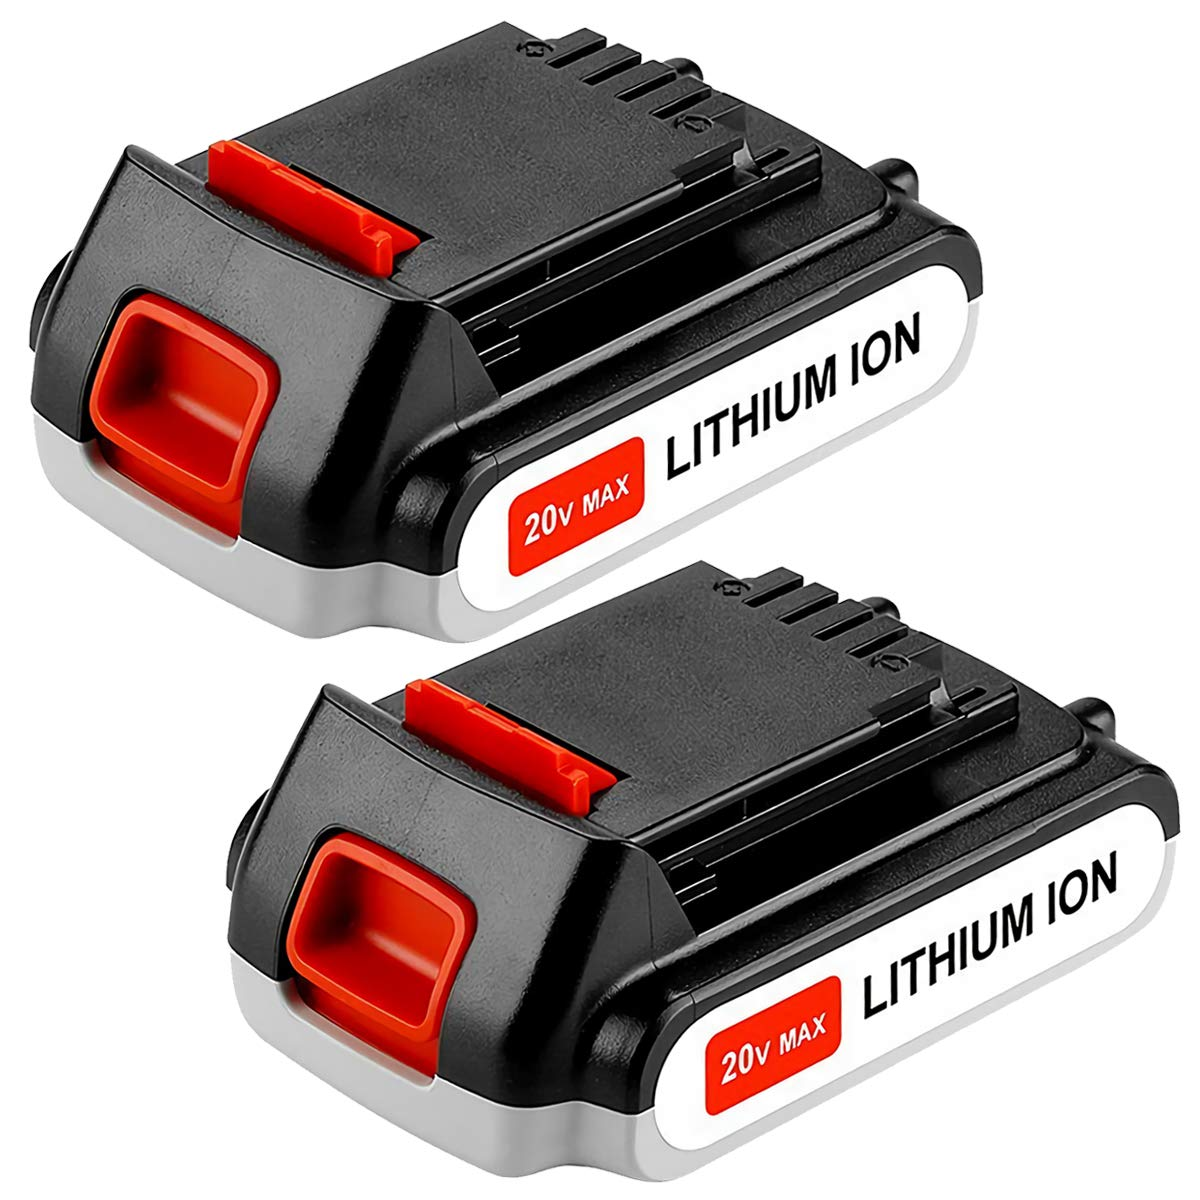 2Pack LBXR20 Replace for Black and Decker 20V Battery 2.0Ah Max Lithium LB20 LBX20 LST220 LBXR2020-OPE LBXR20B-2 LB2X4020 Cordless Tool Batteries